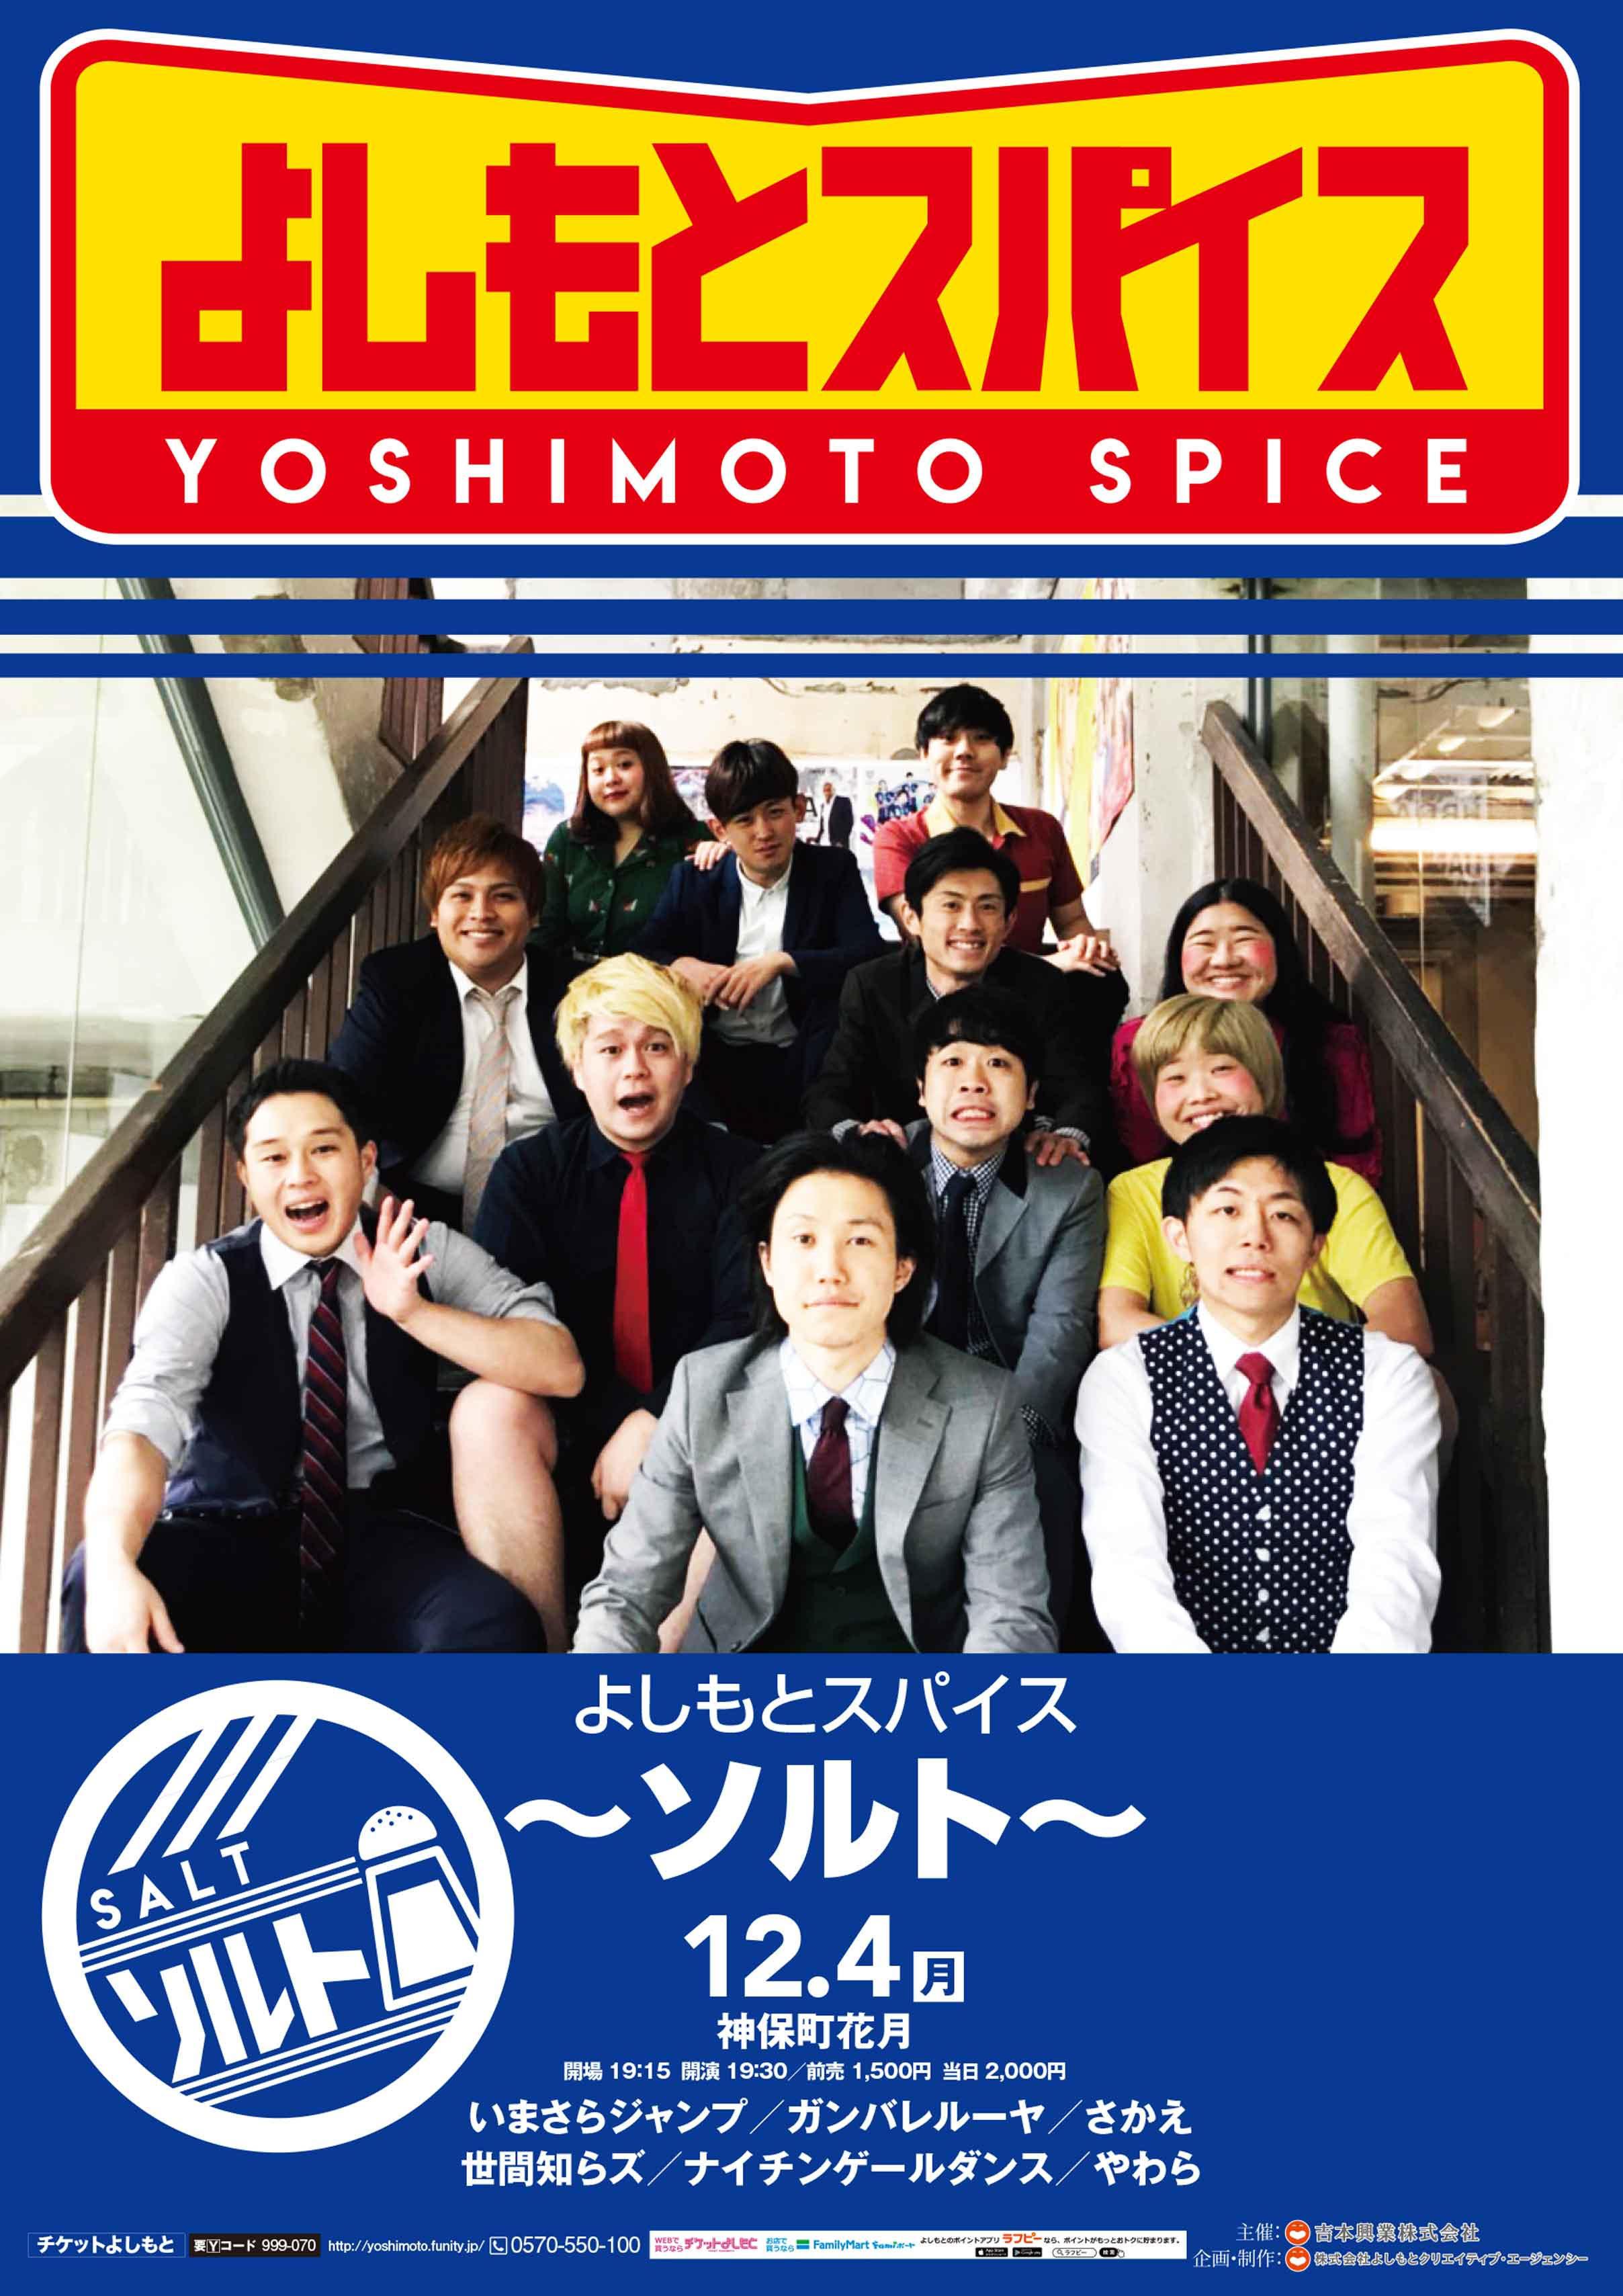 http://news.yoshimoto.co.jp/20171109122108-165a53eeeb322a9fbaf44bbd4ab1546d0779cf07.jpg